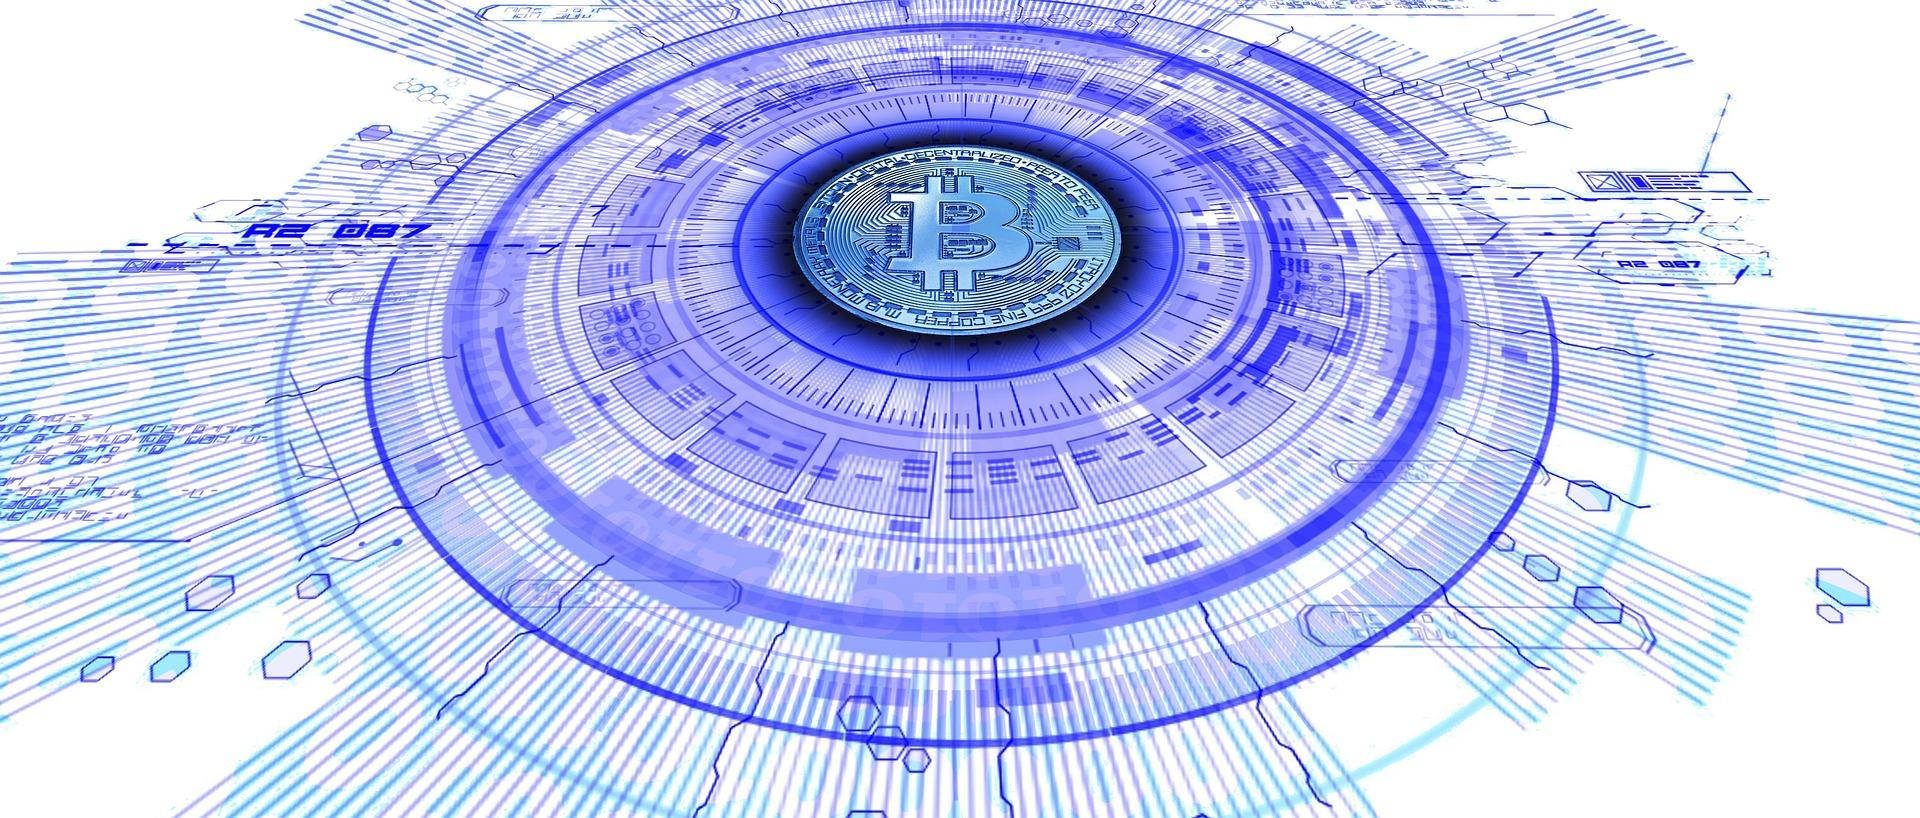 Decentralized finance next phase of digital finance